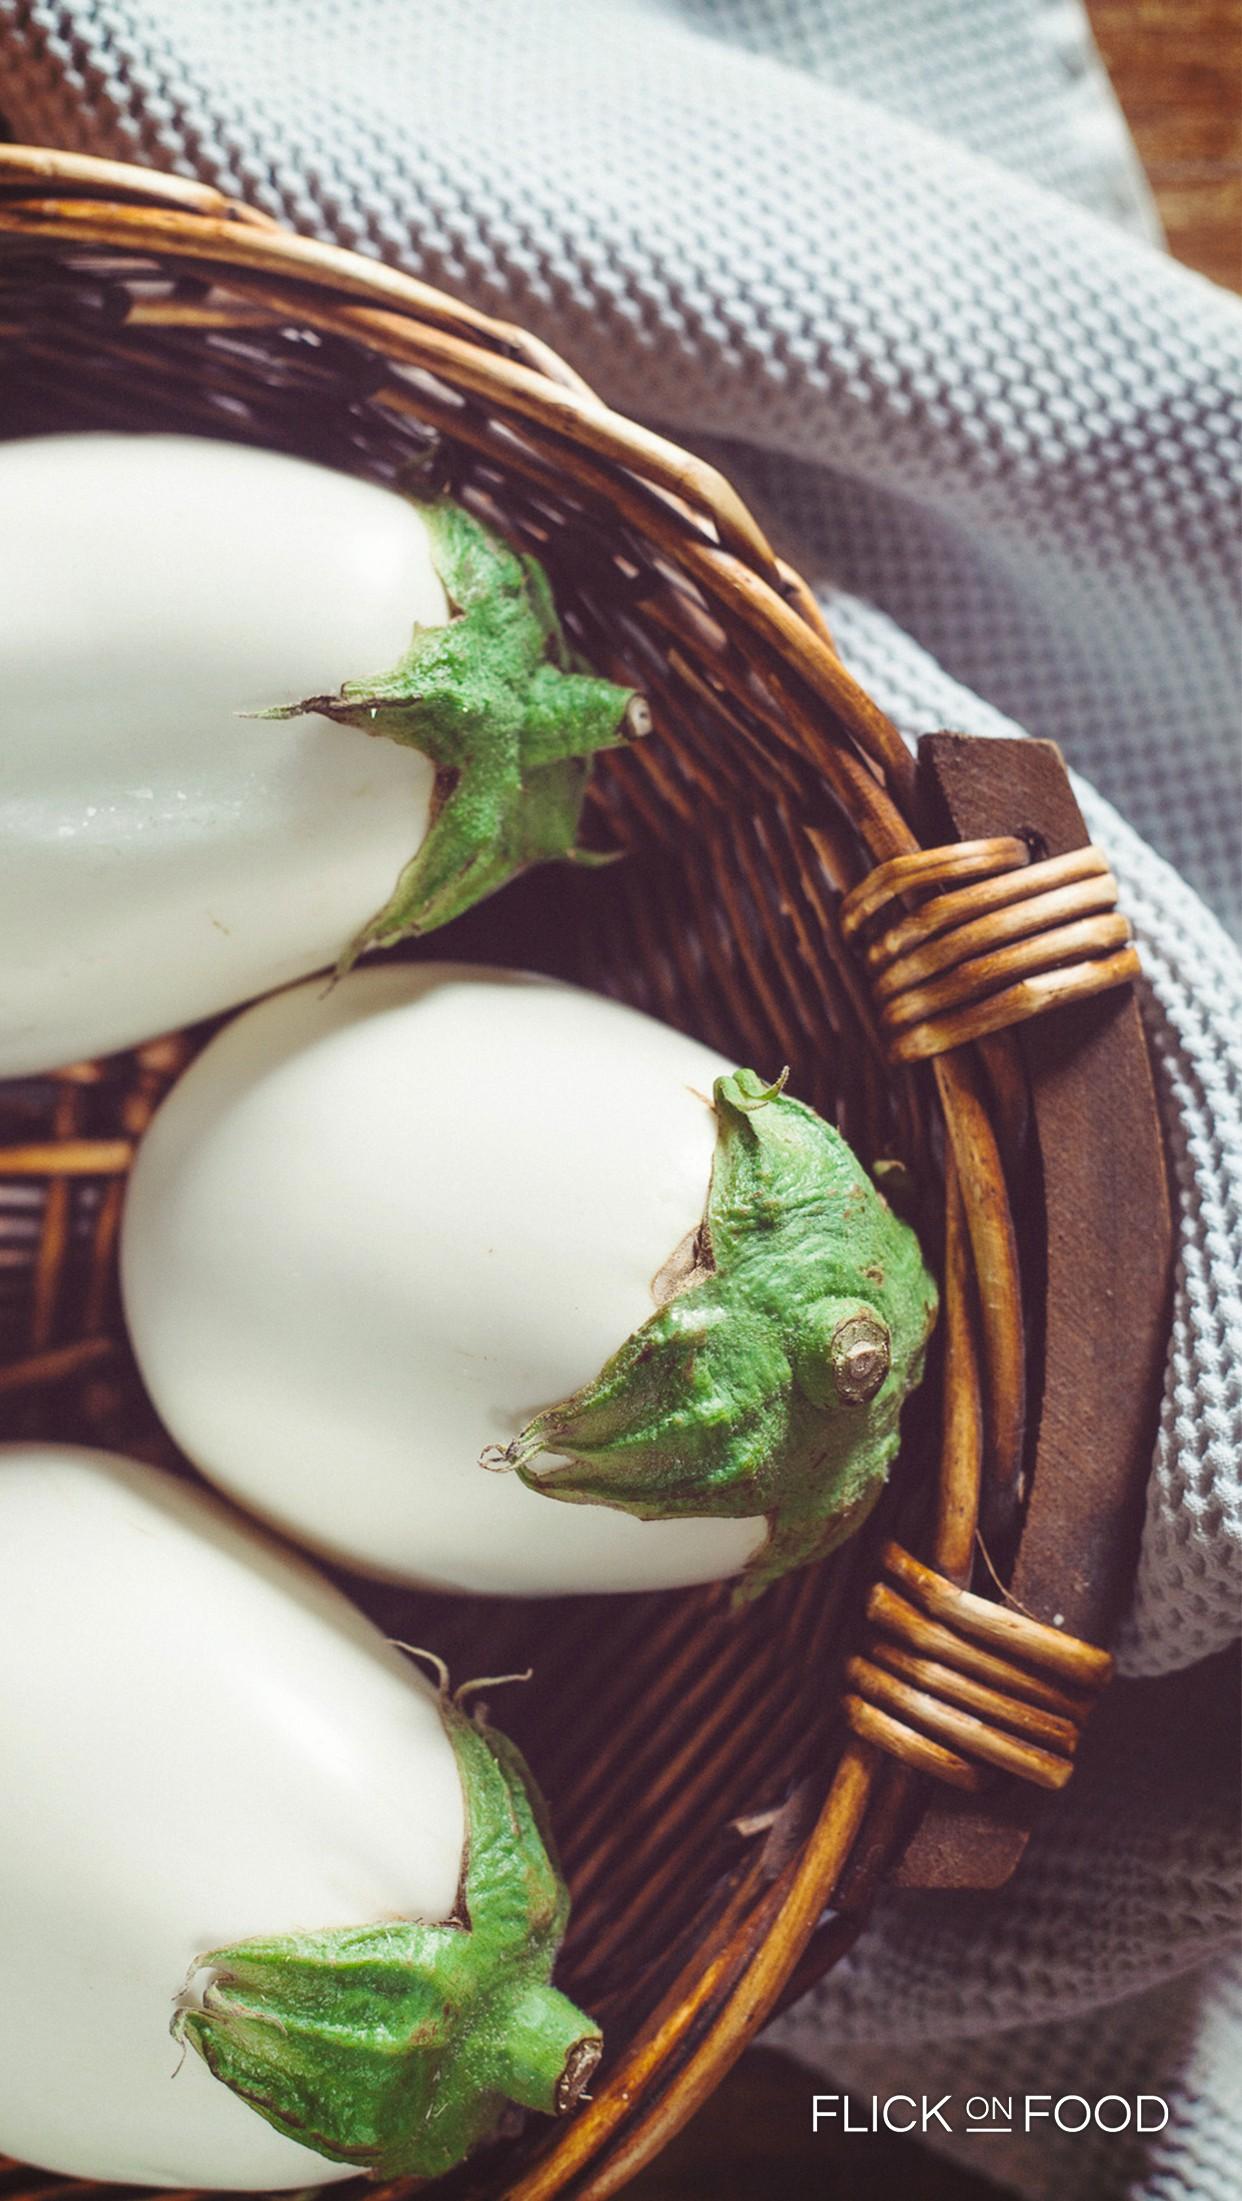 Melanzana bianca | Flick on Food